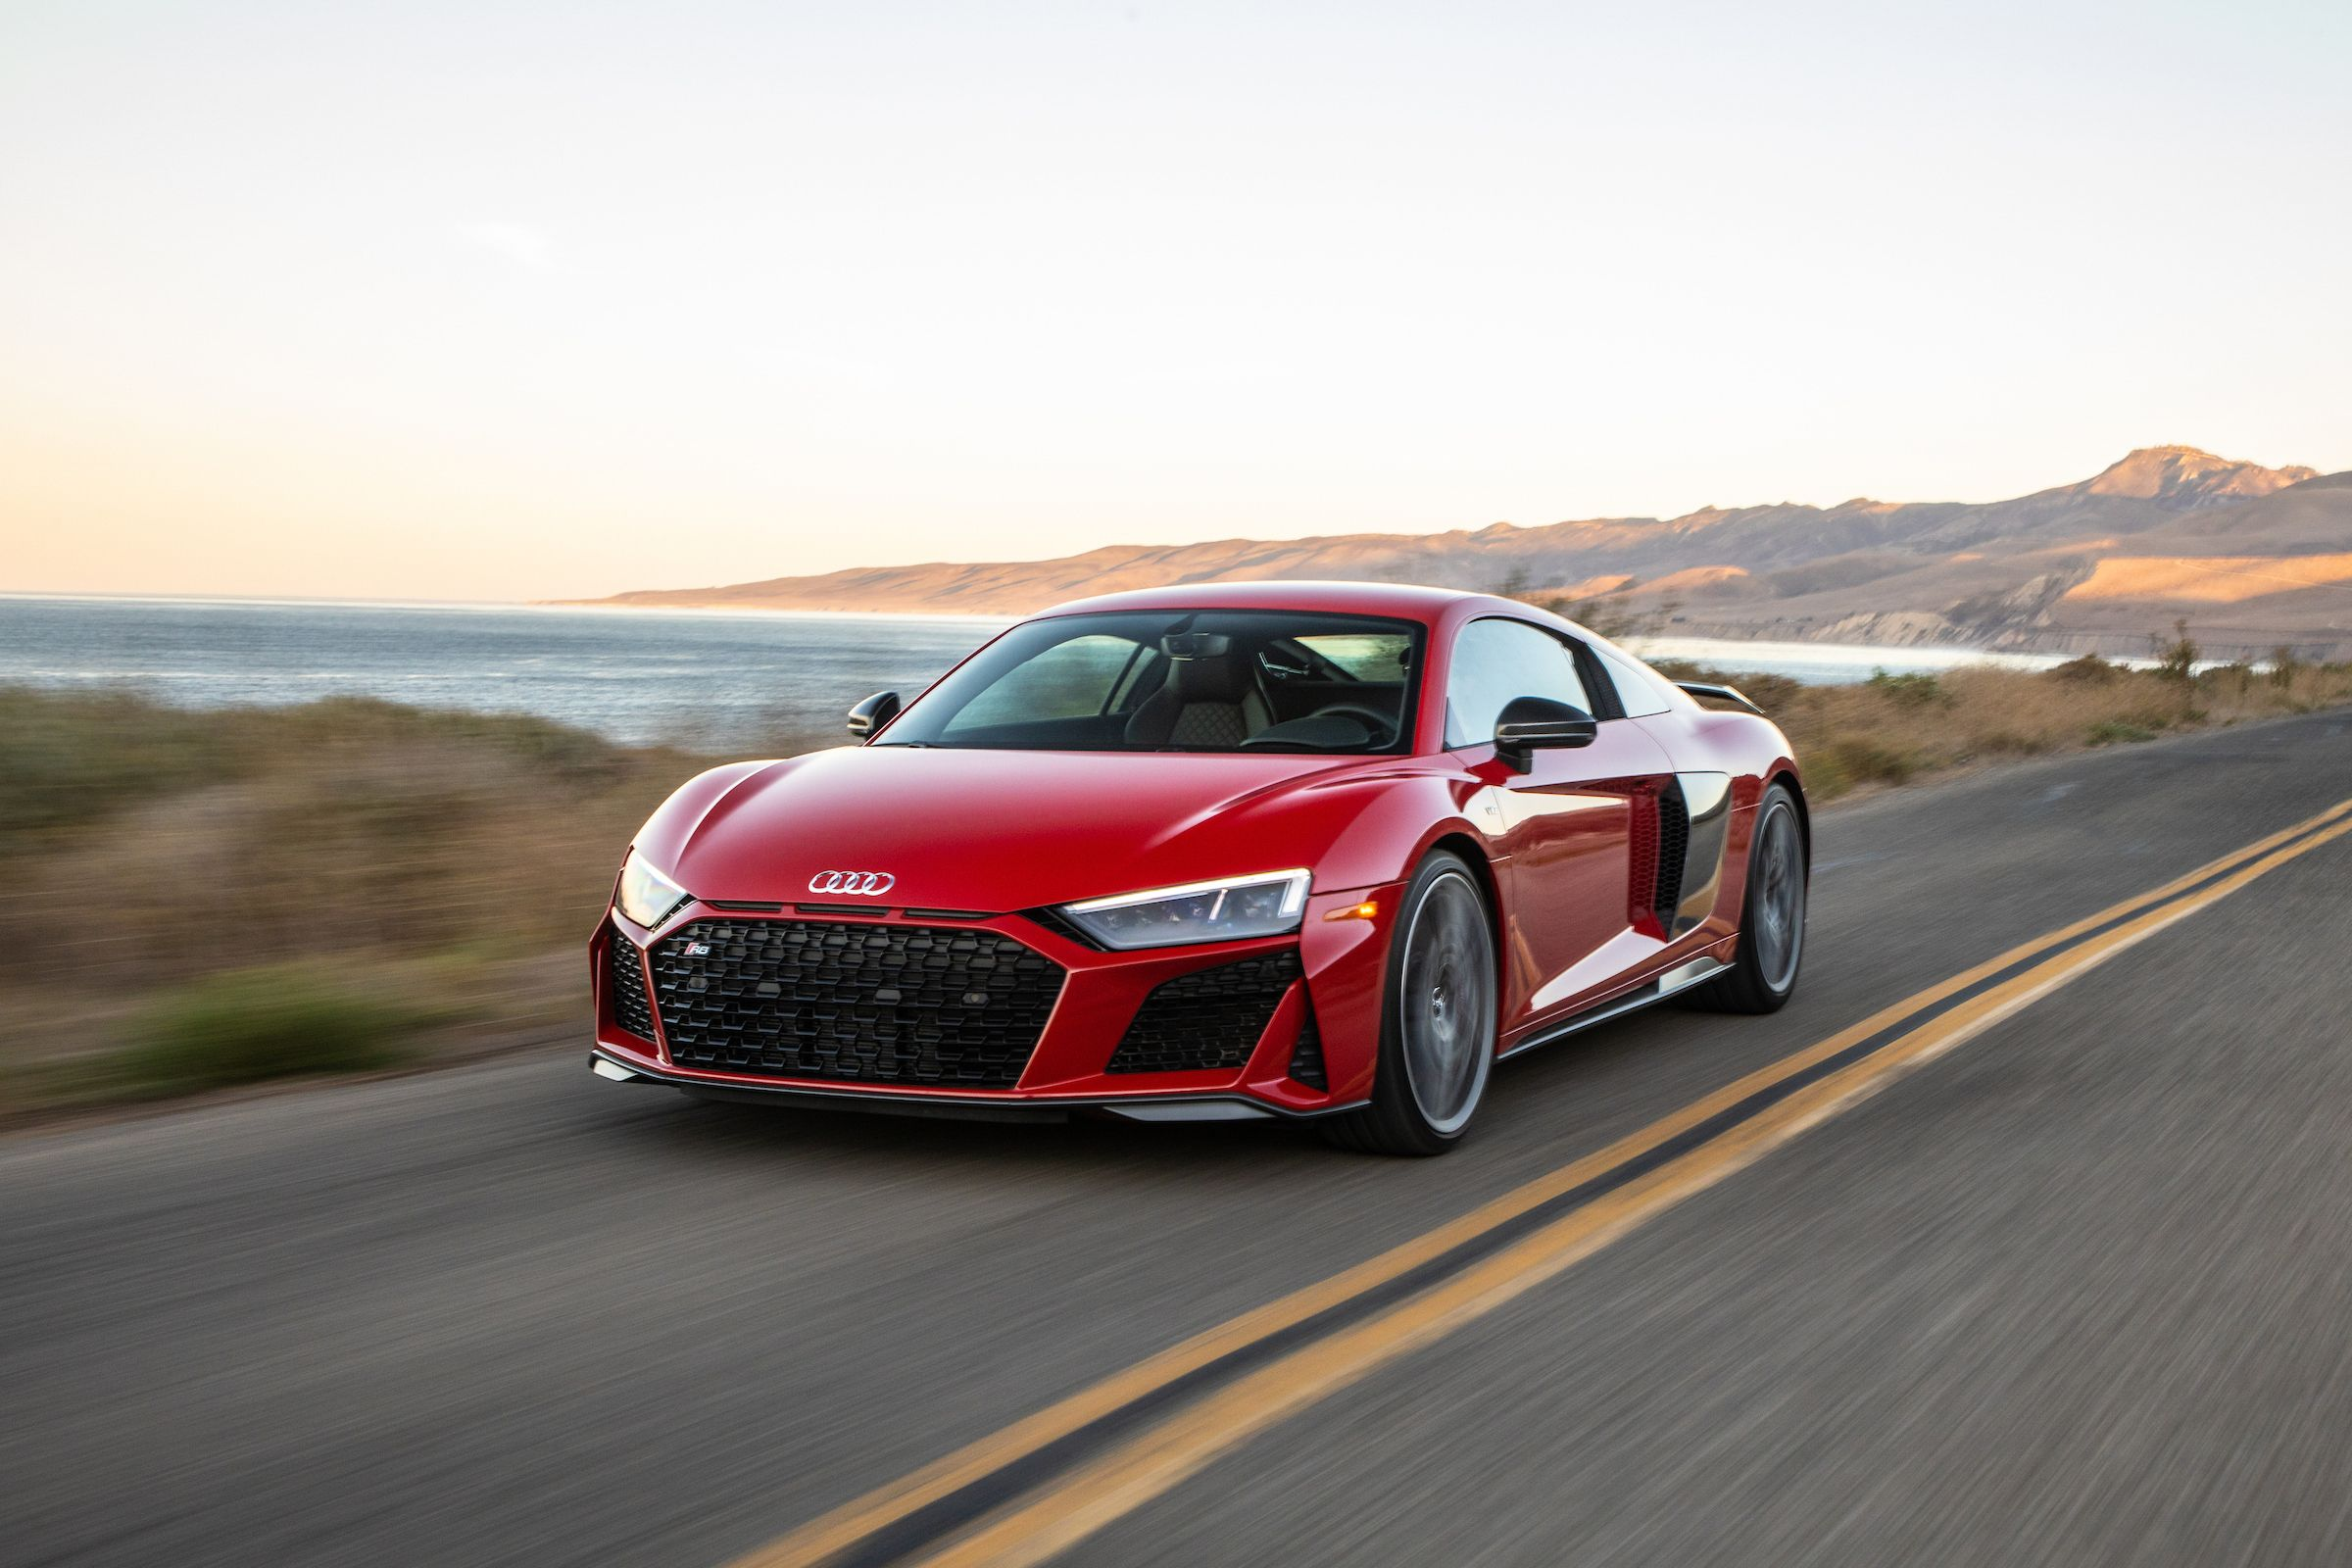 Kelebihan Audi Sr8 Top Model Tahun Ini